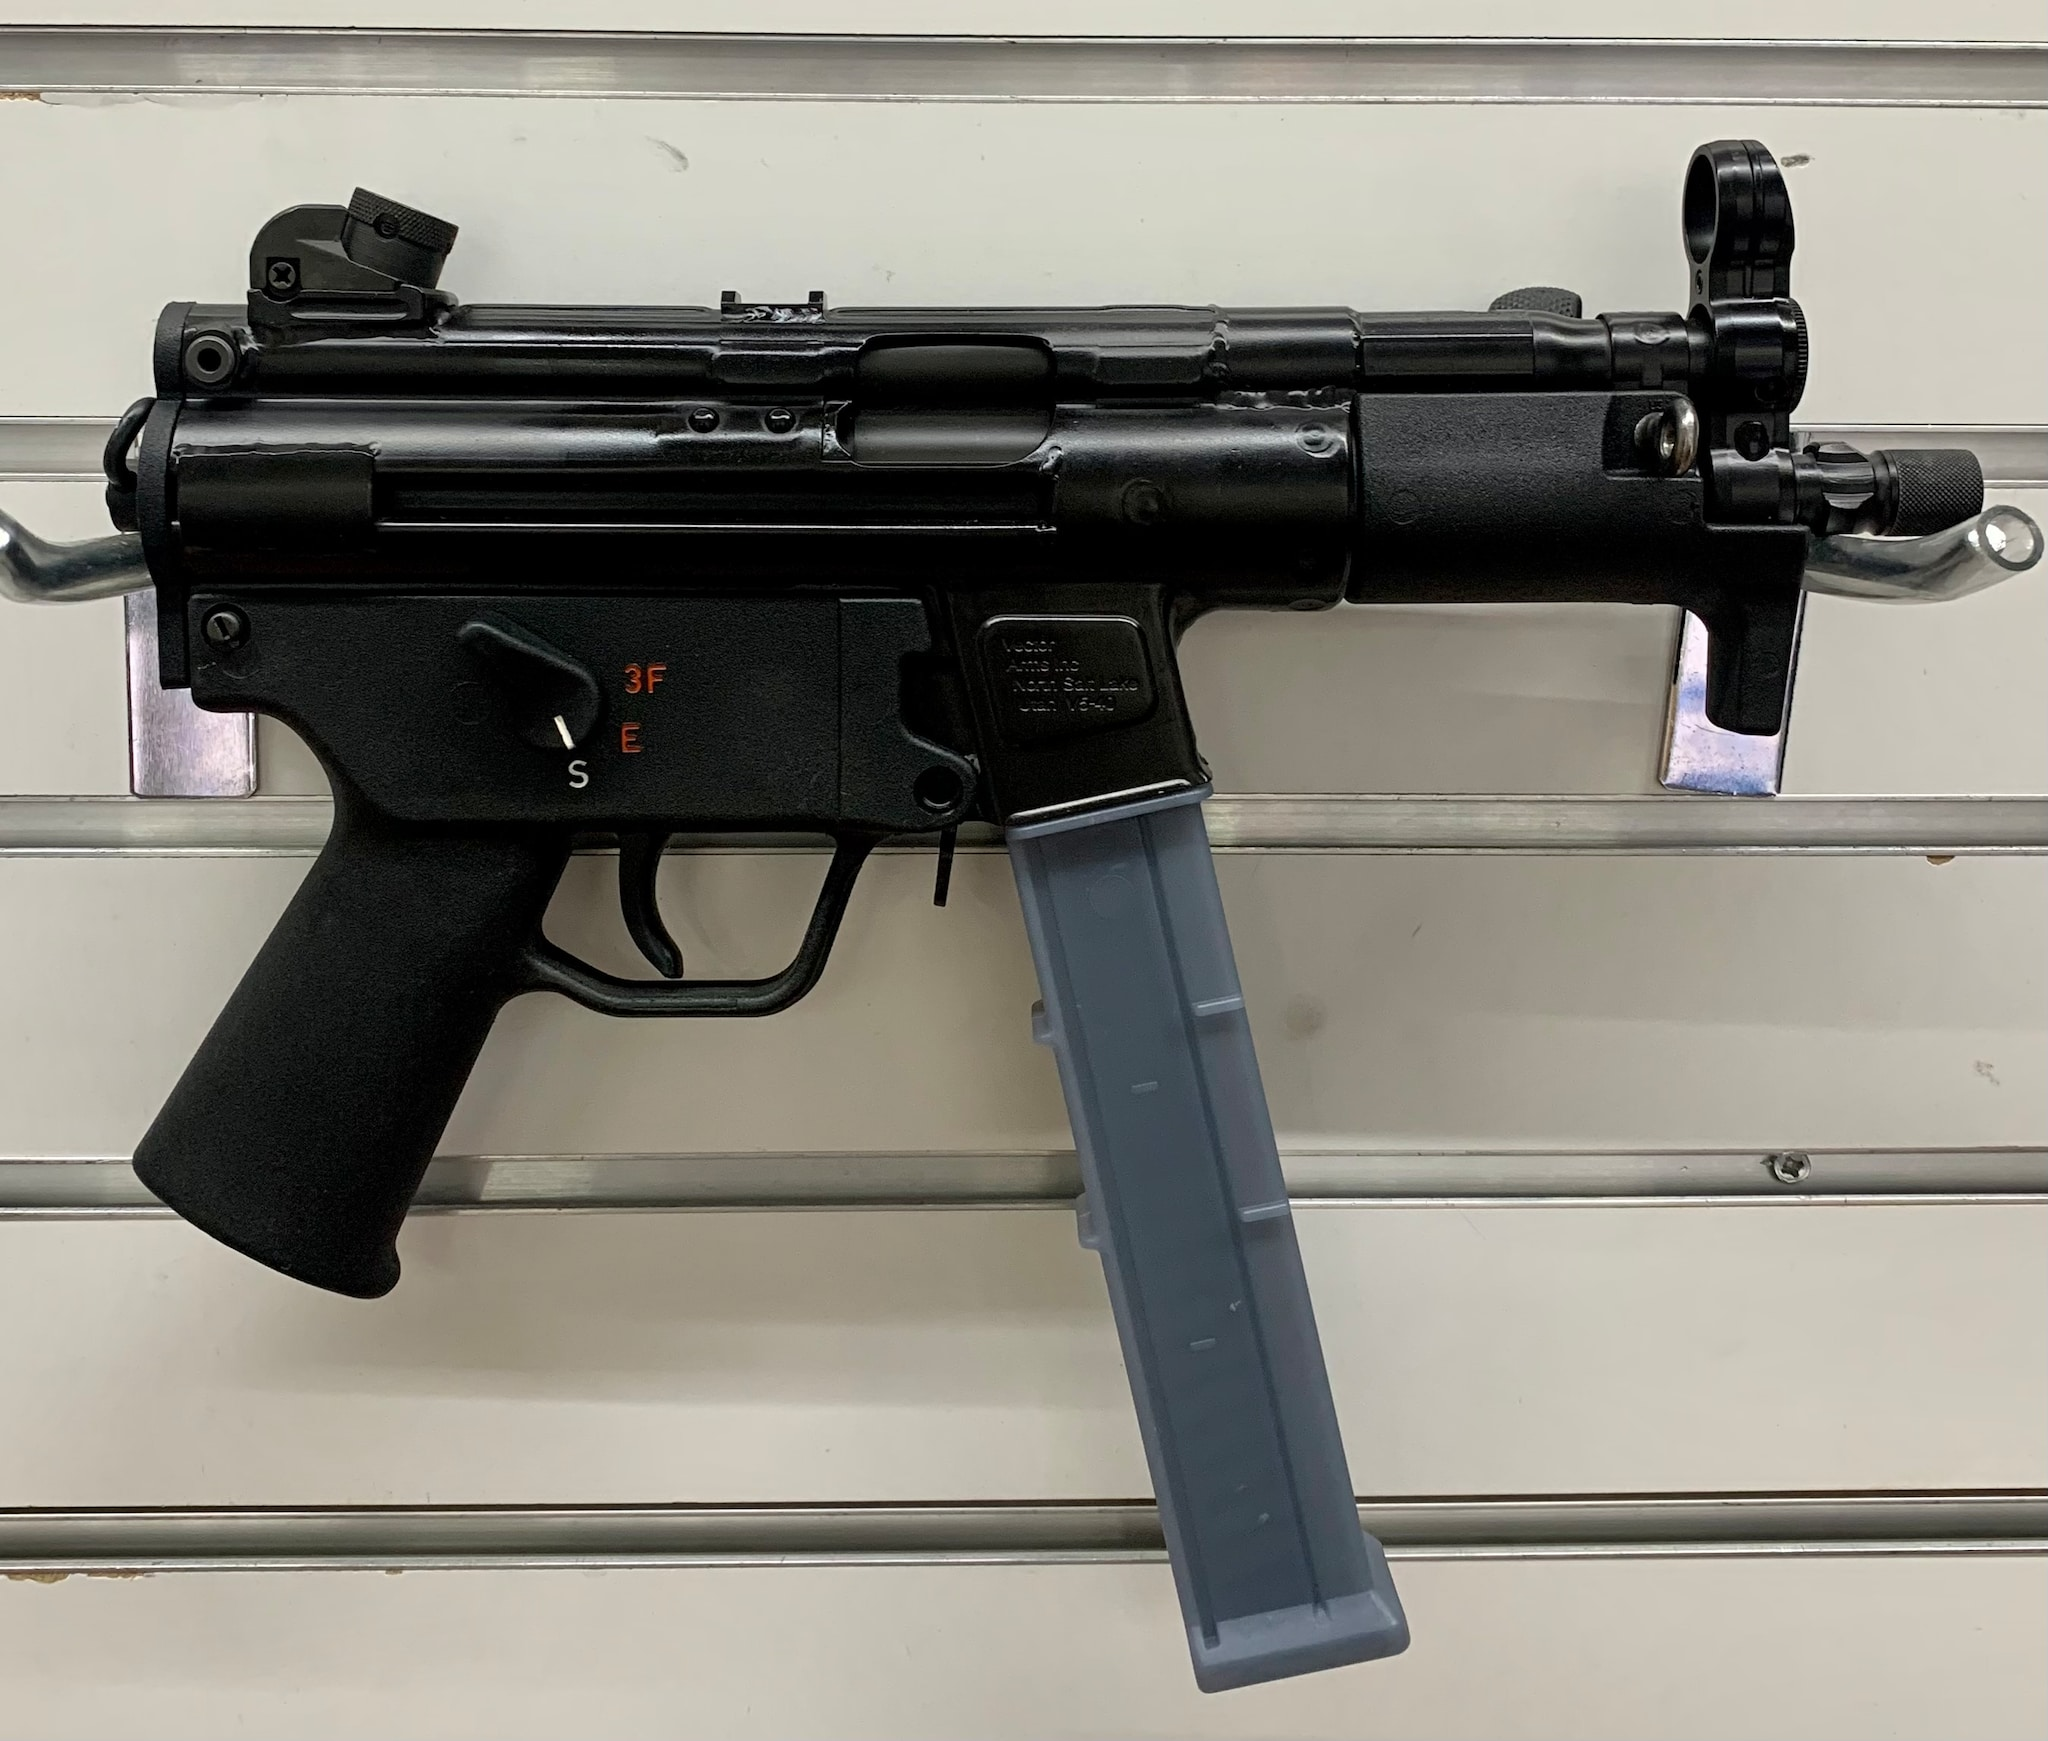 VECTOR ARMS, INC. v5-40